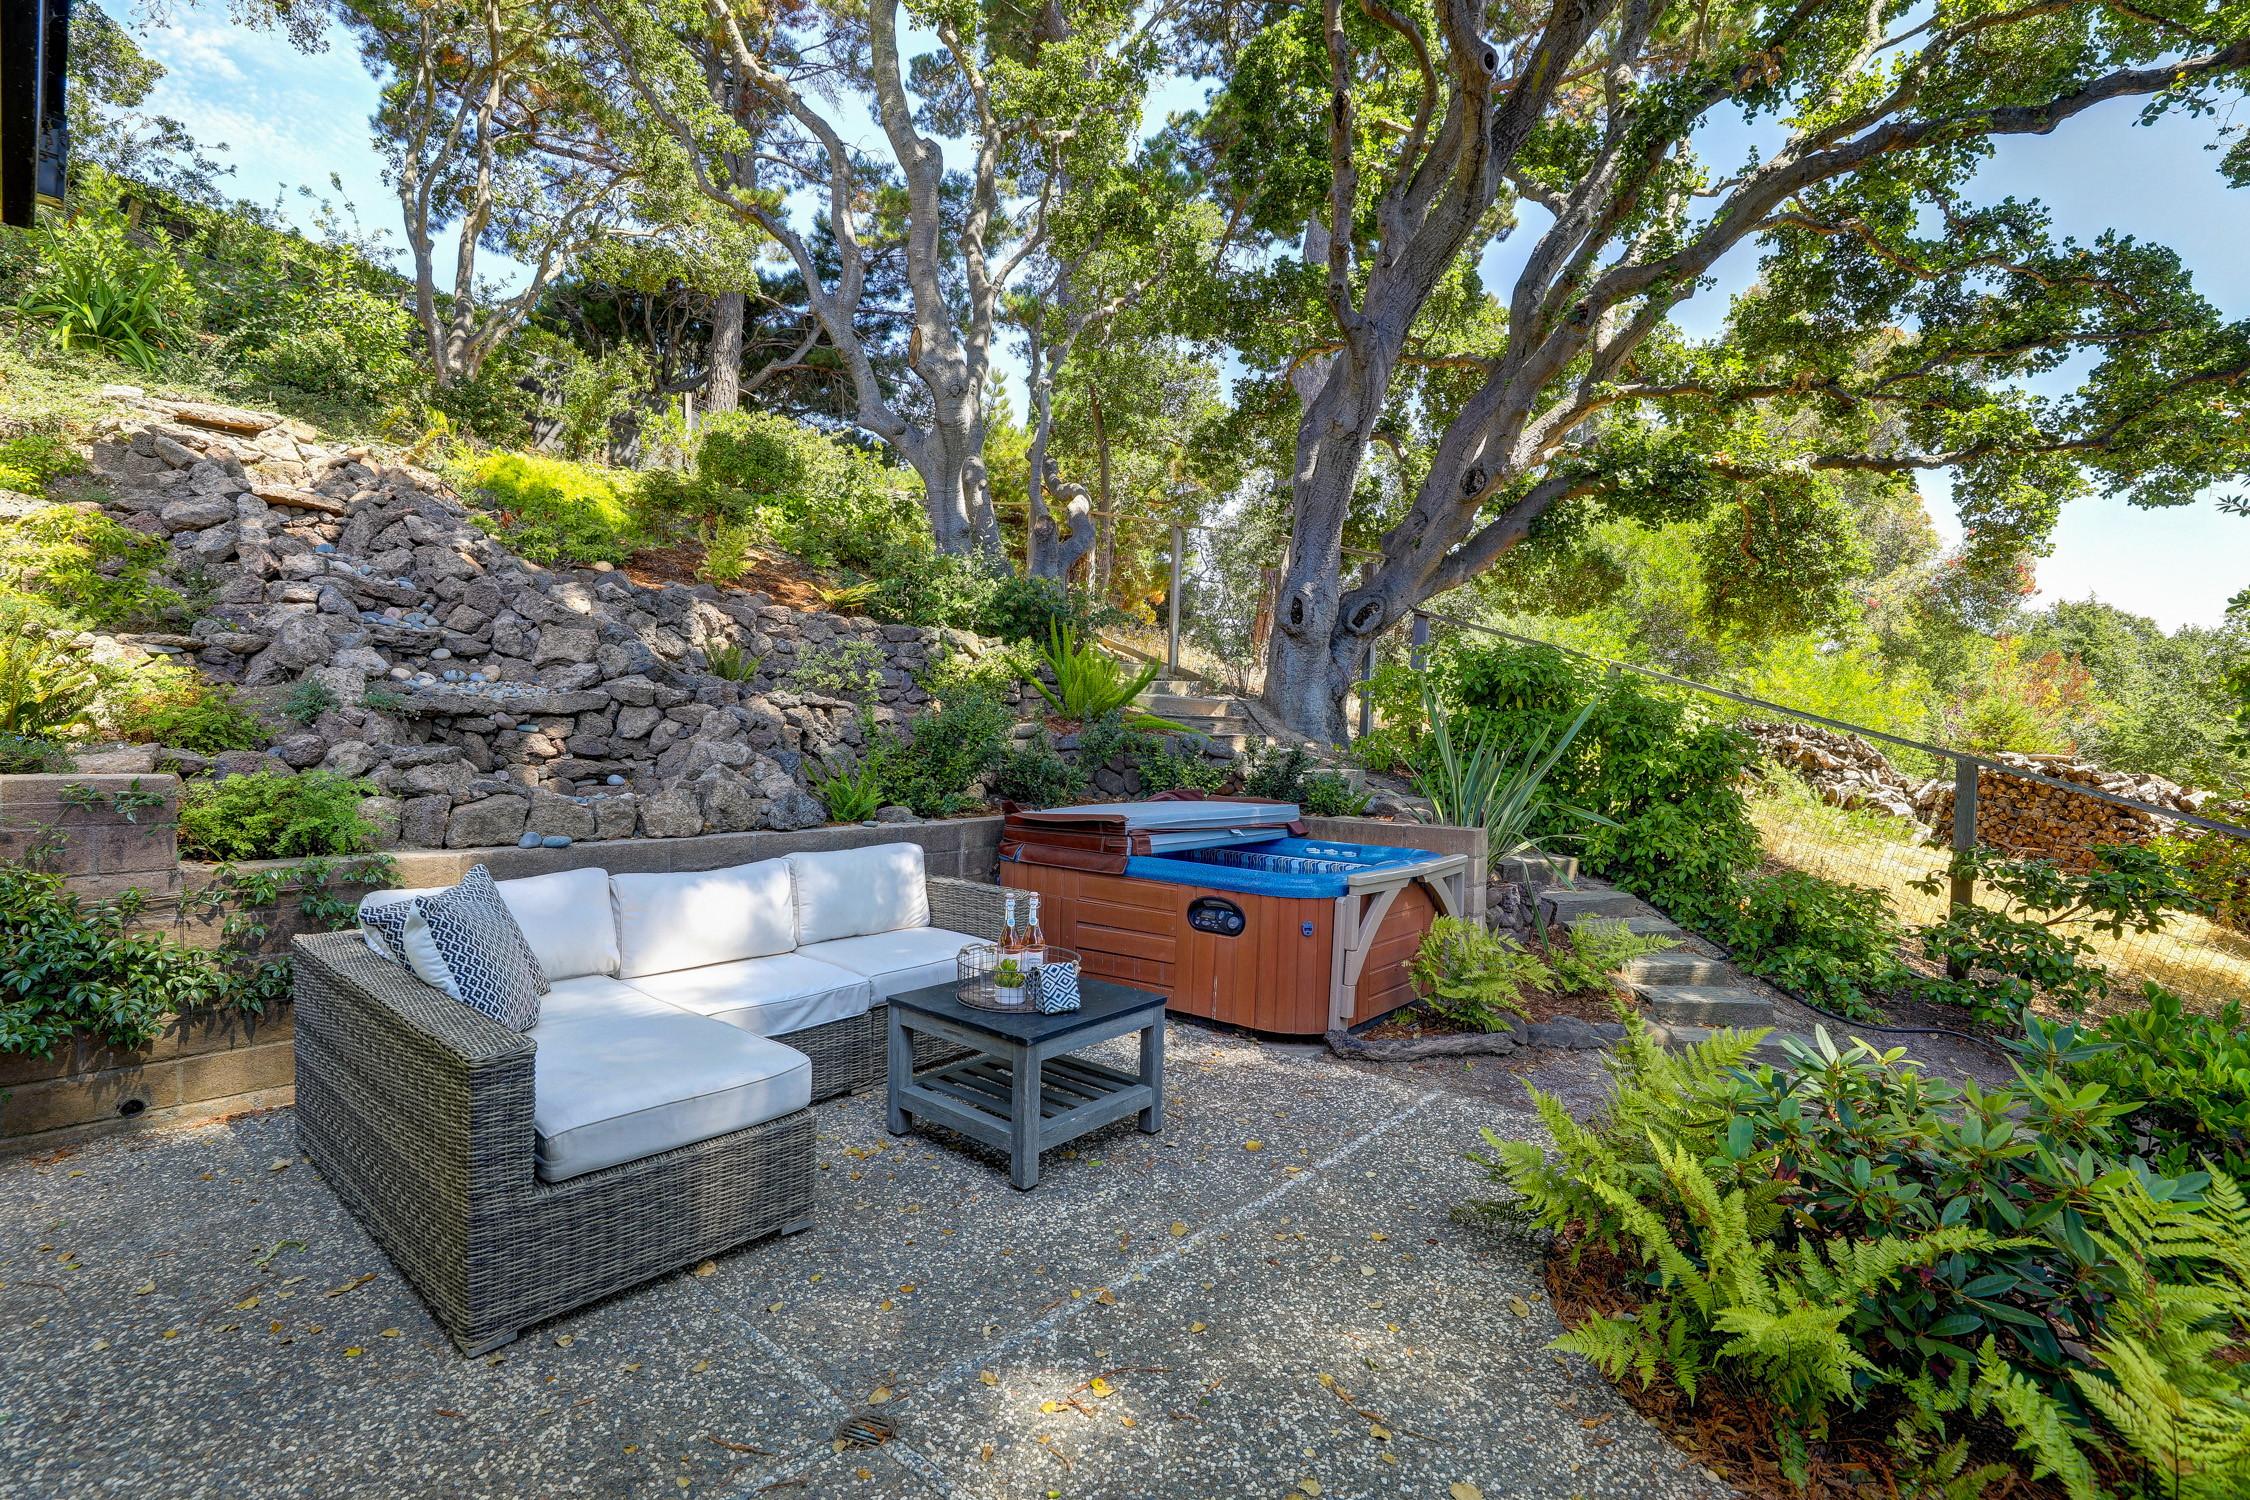 16Dorian 63 MLSSan Rafael Real Estate - Listed by Julia Fitzpatrick + Allie Fornesi Team Own Marin County .jpg